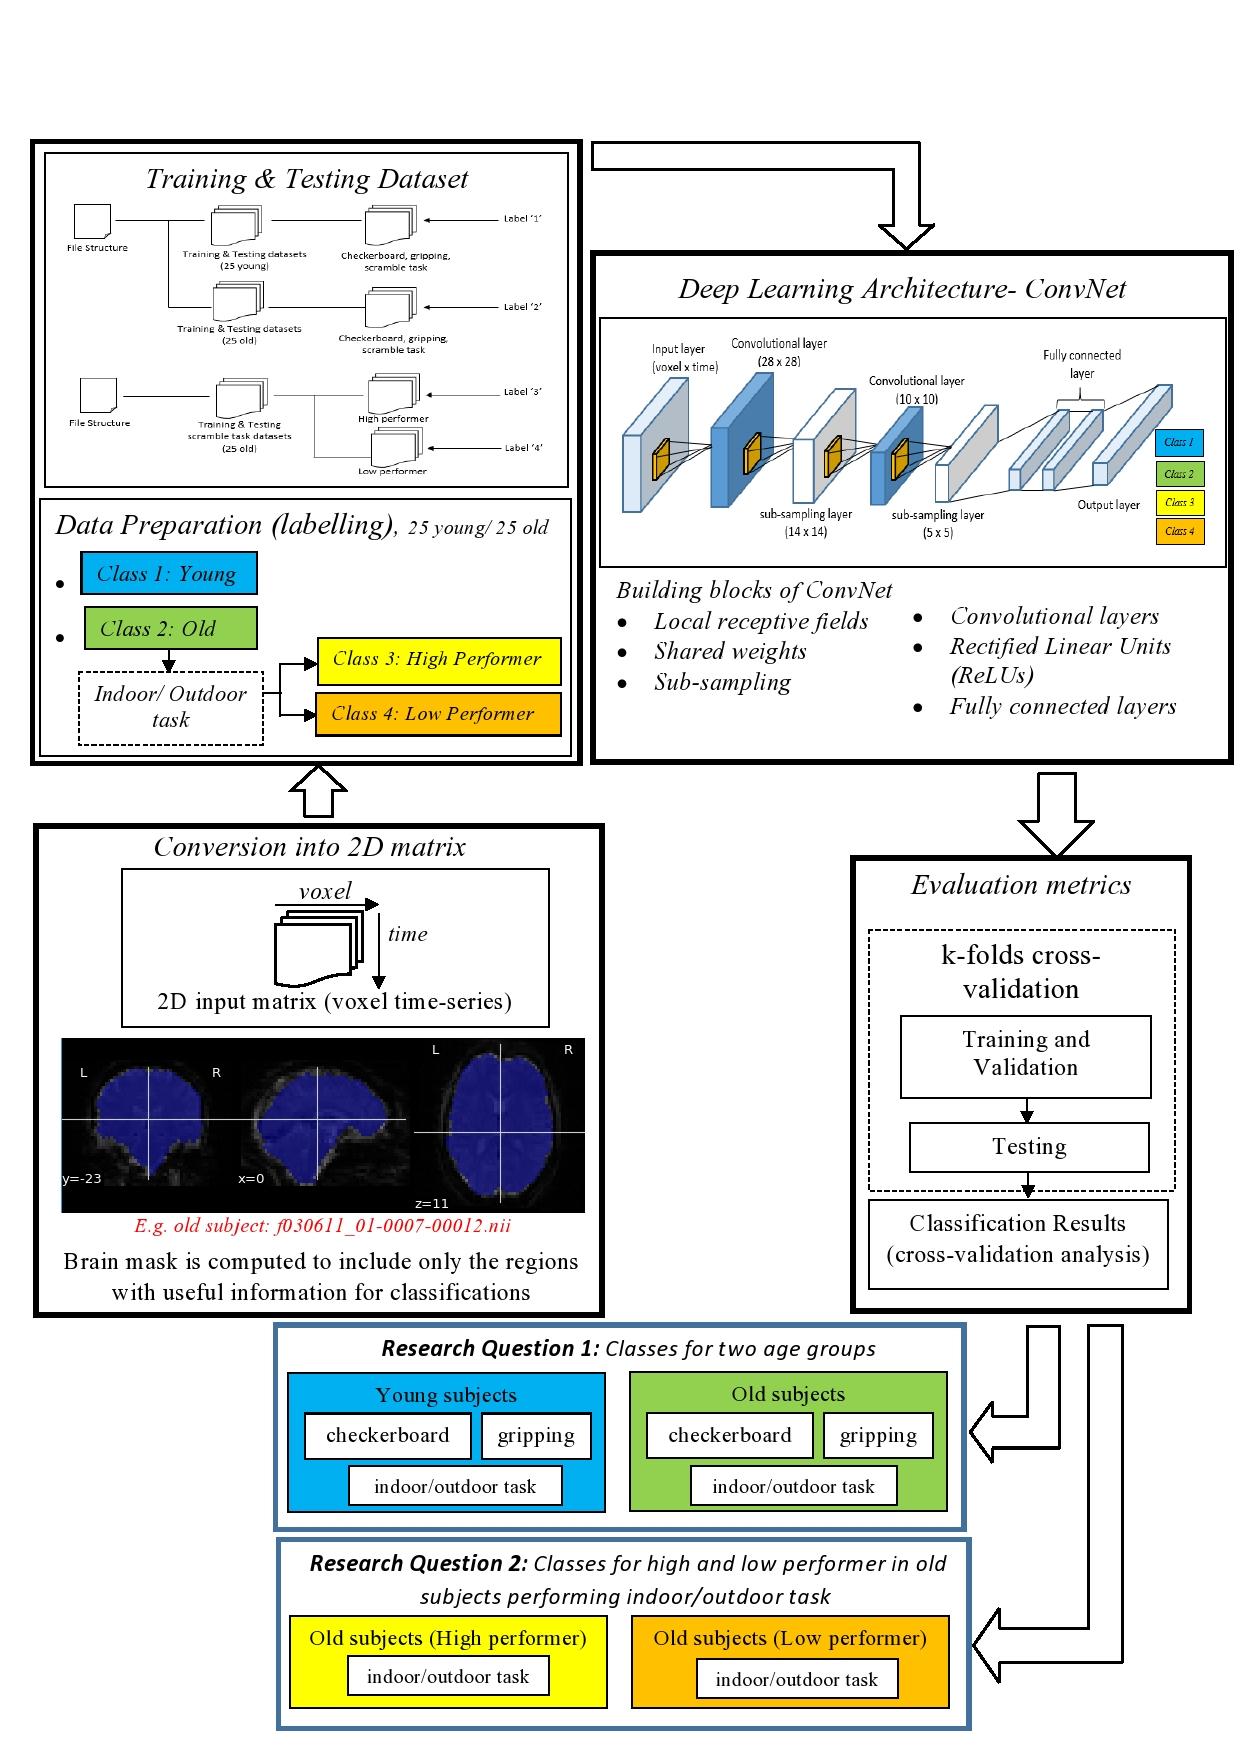 Neuroinformatics 2017